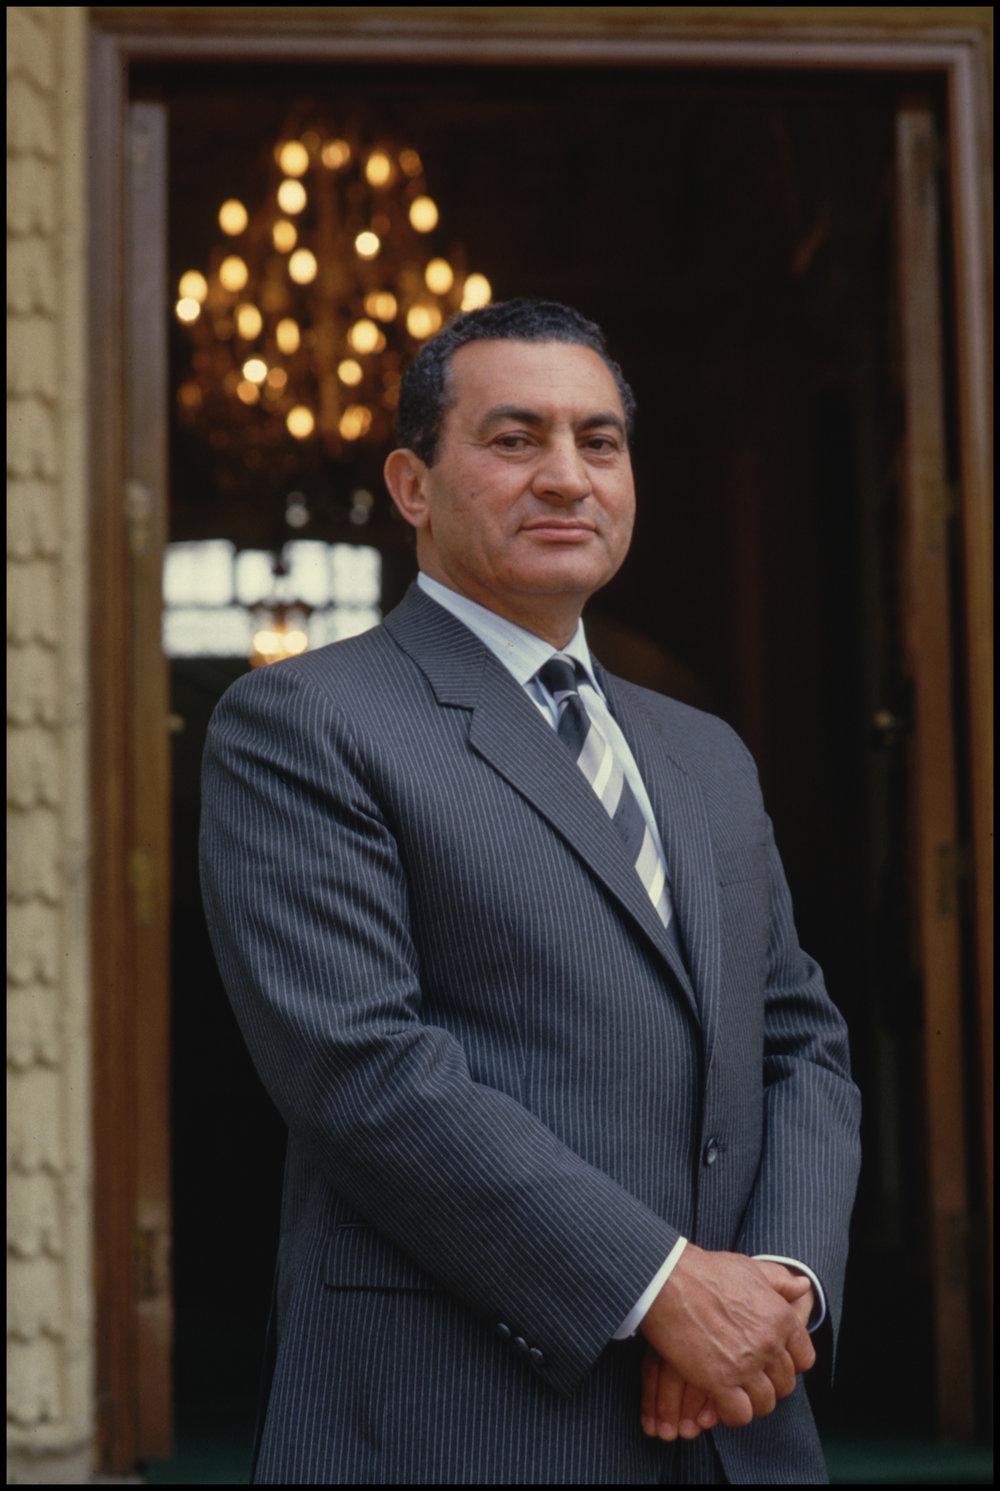 1986, Cairo, Egypt --- Egyptian President Hosni Mubarak